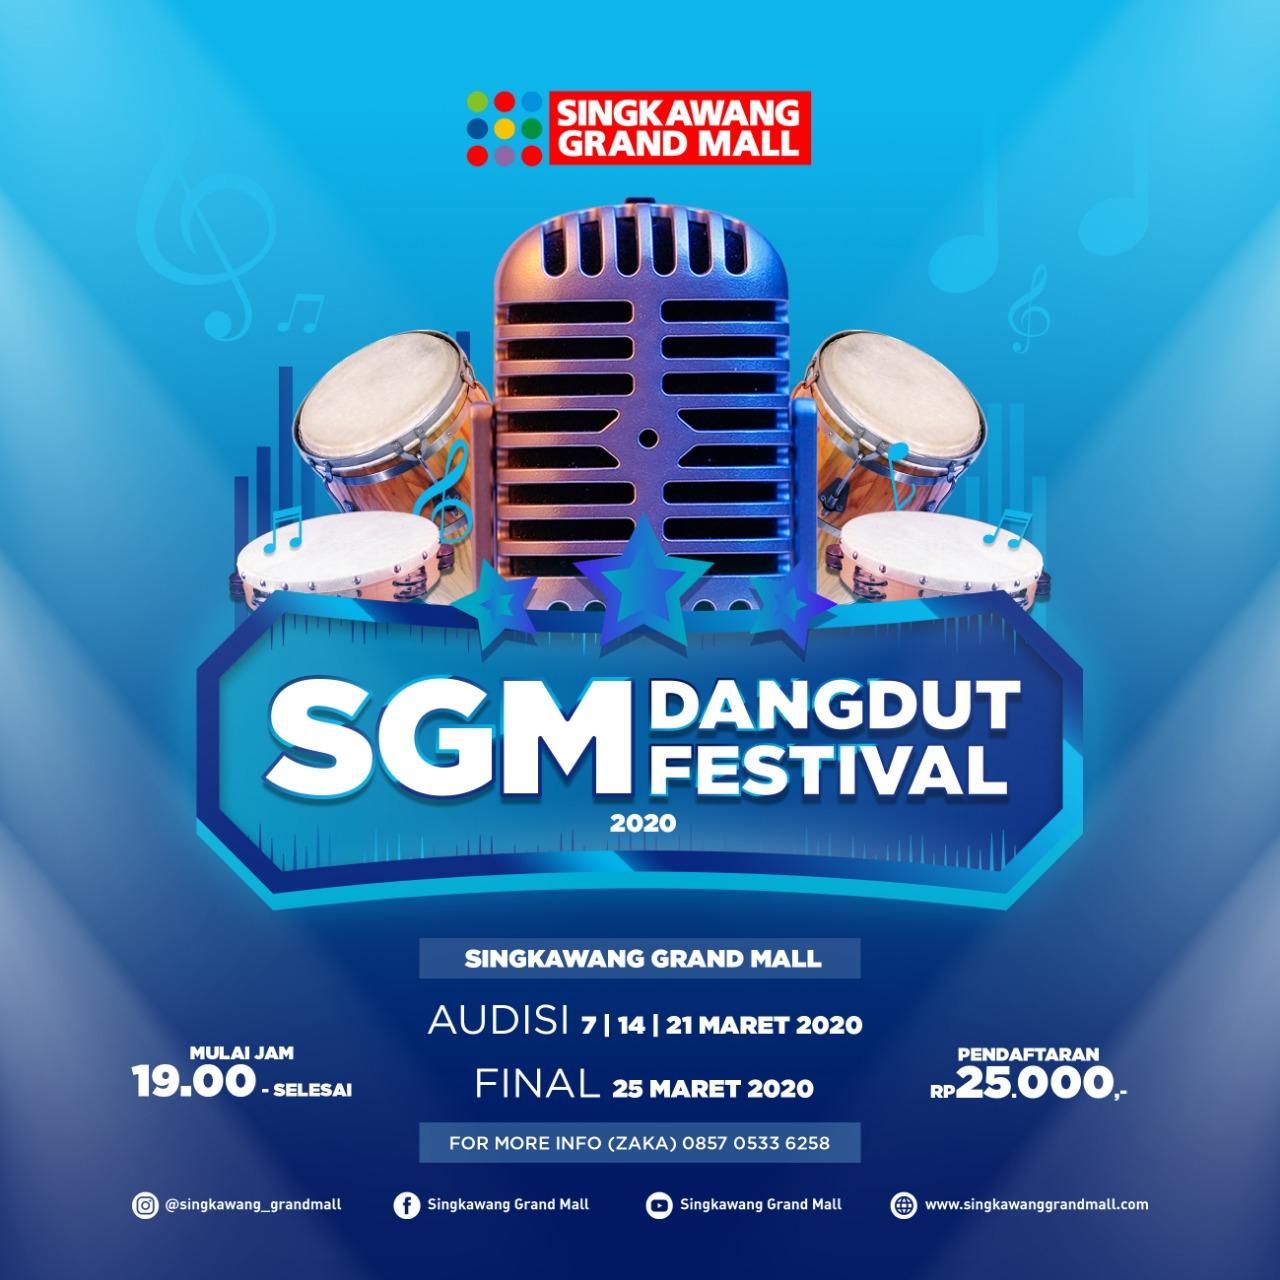 SGM Dangdut Festival 2020